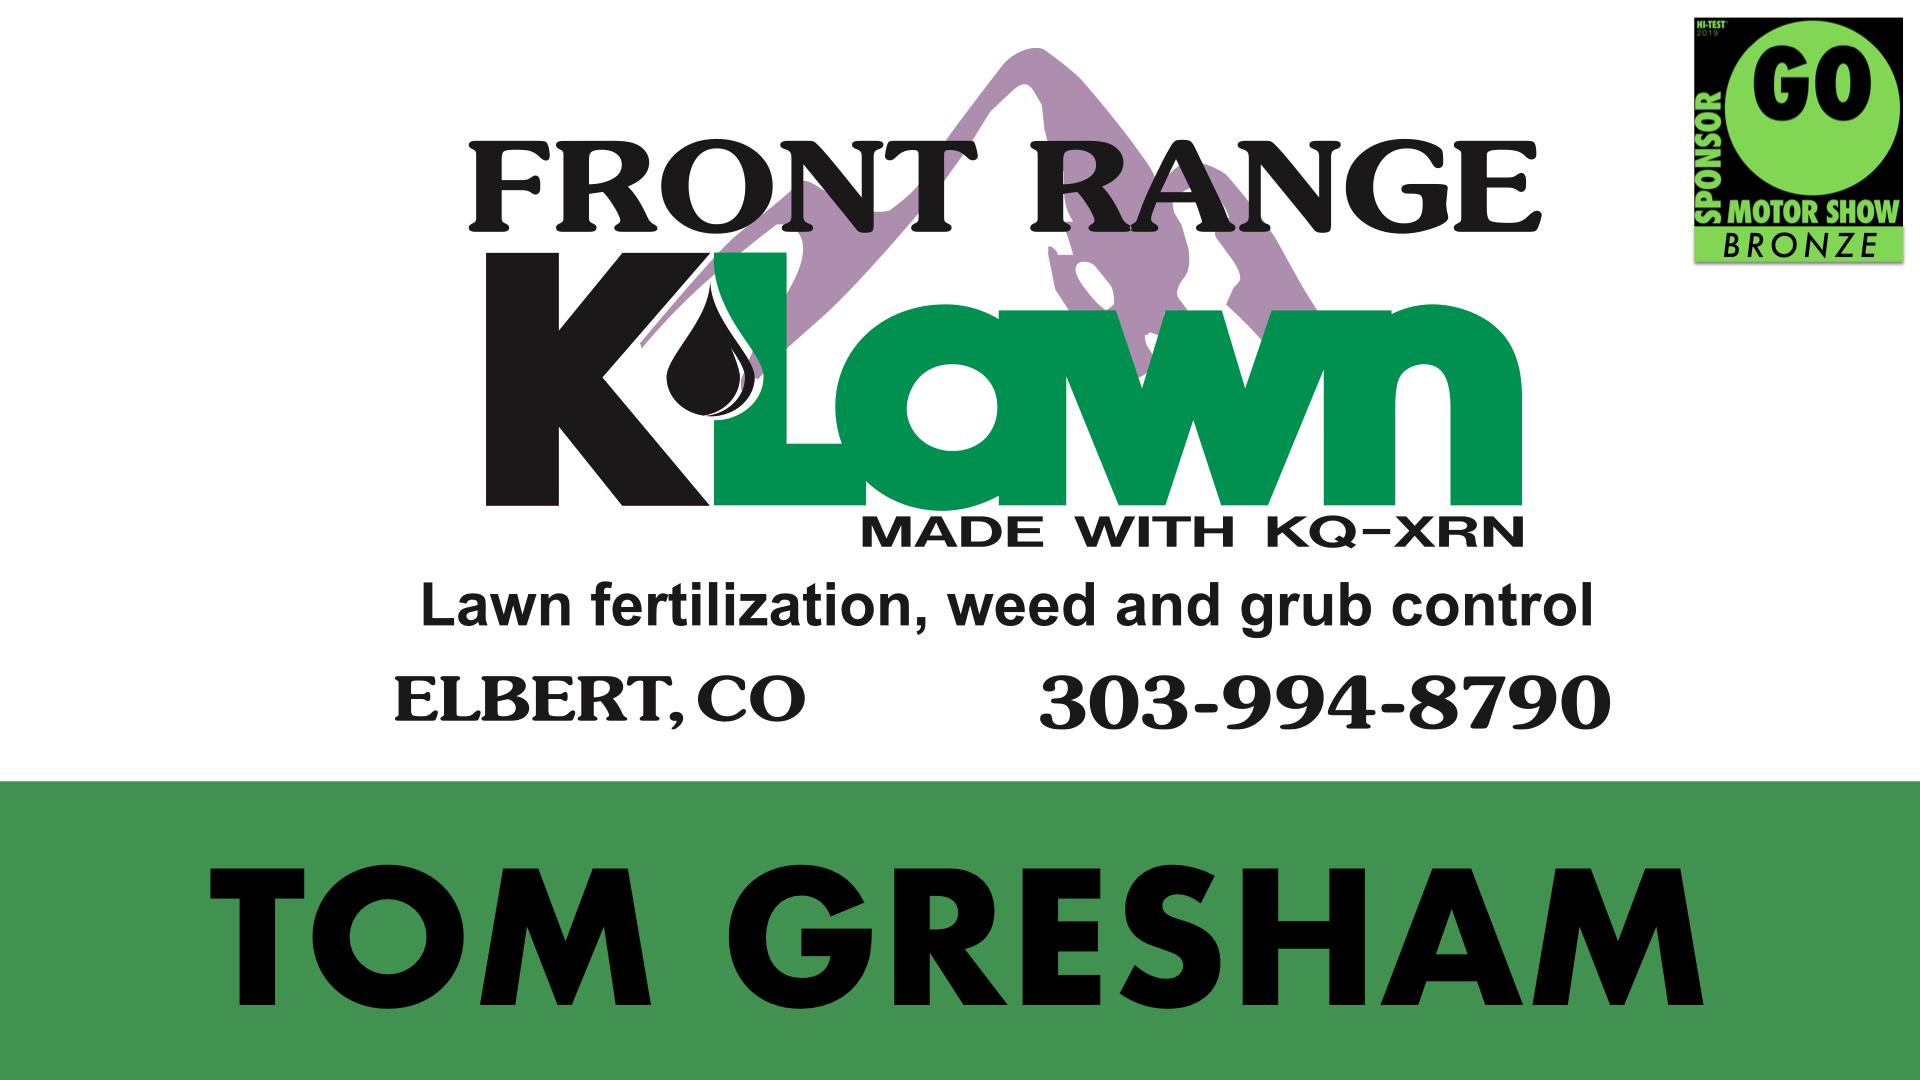 Front Range K-Lawn Tom Gresham